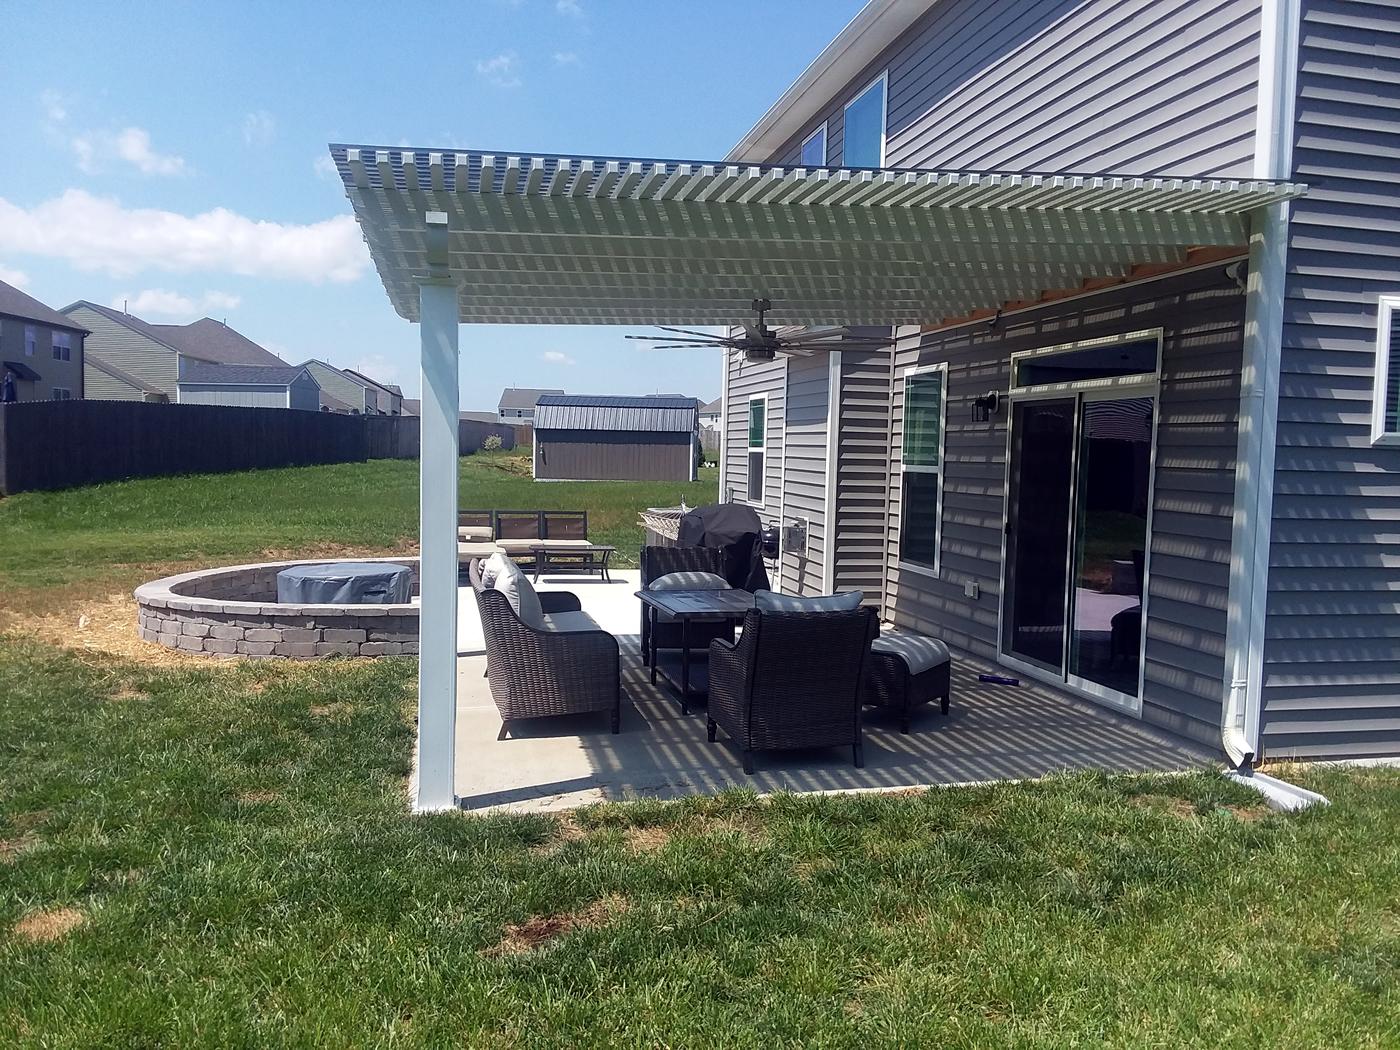 Pergola over patio seating area